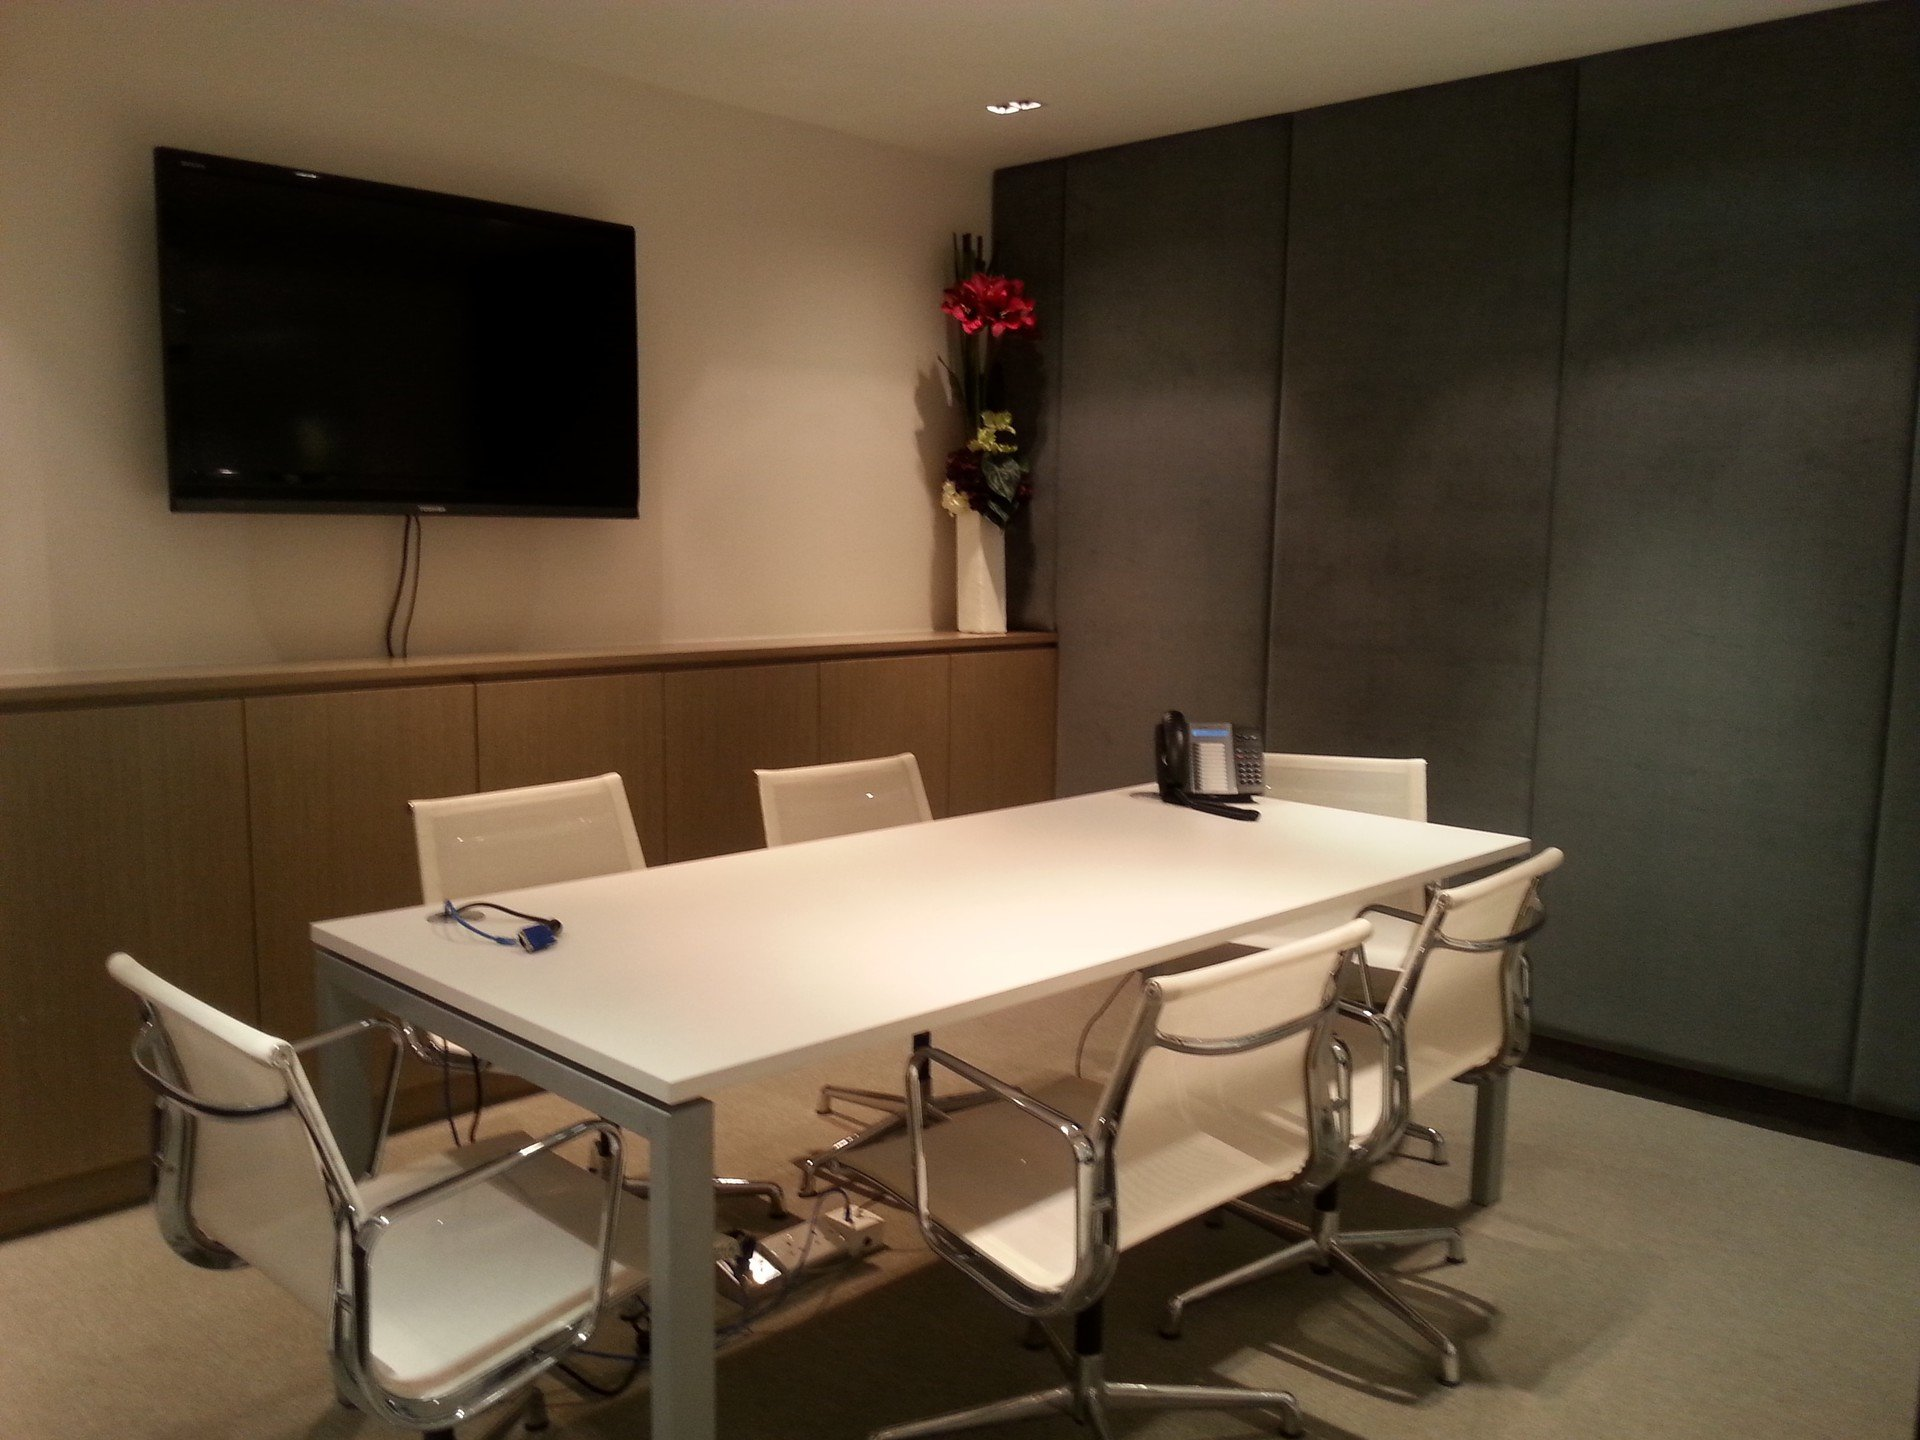 Hong Kong conference rooms Meetingraum Jumpstart Causeway Bay - 6 Person Meeting Room image 0